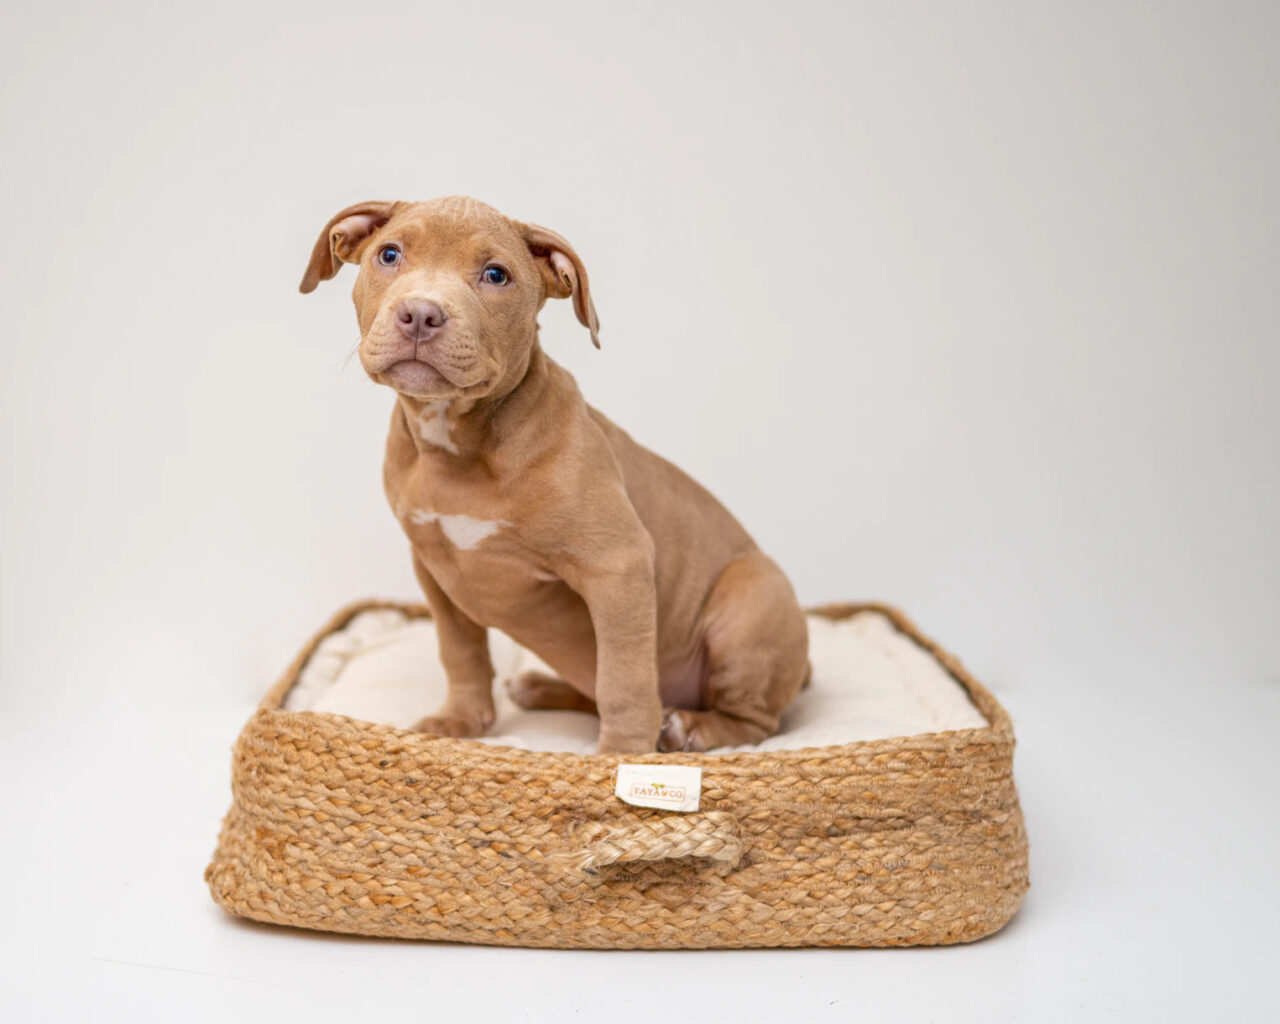 https://ilovemydogsomuch.com/wp-content/uploads/2021/05/new-dog-owner-shopping-list-bed-1280x1024.jpg